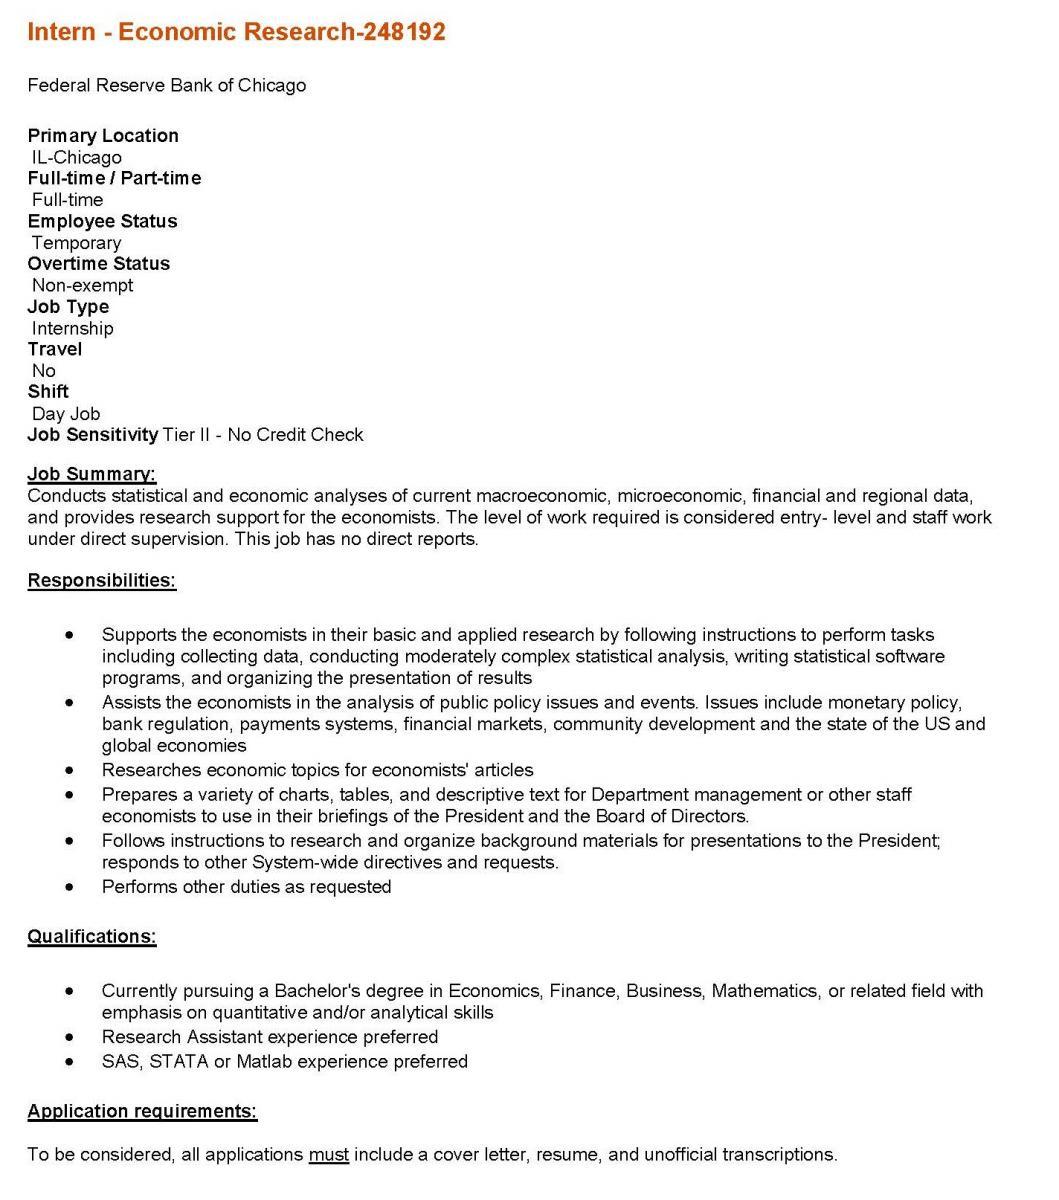 FEDERAL RESERVE BANK OF CHICAGO: INTERNSHIP | Department of Economics